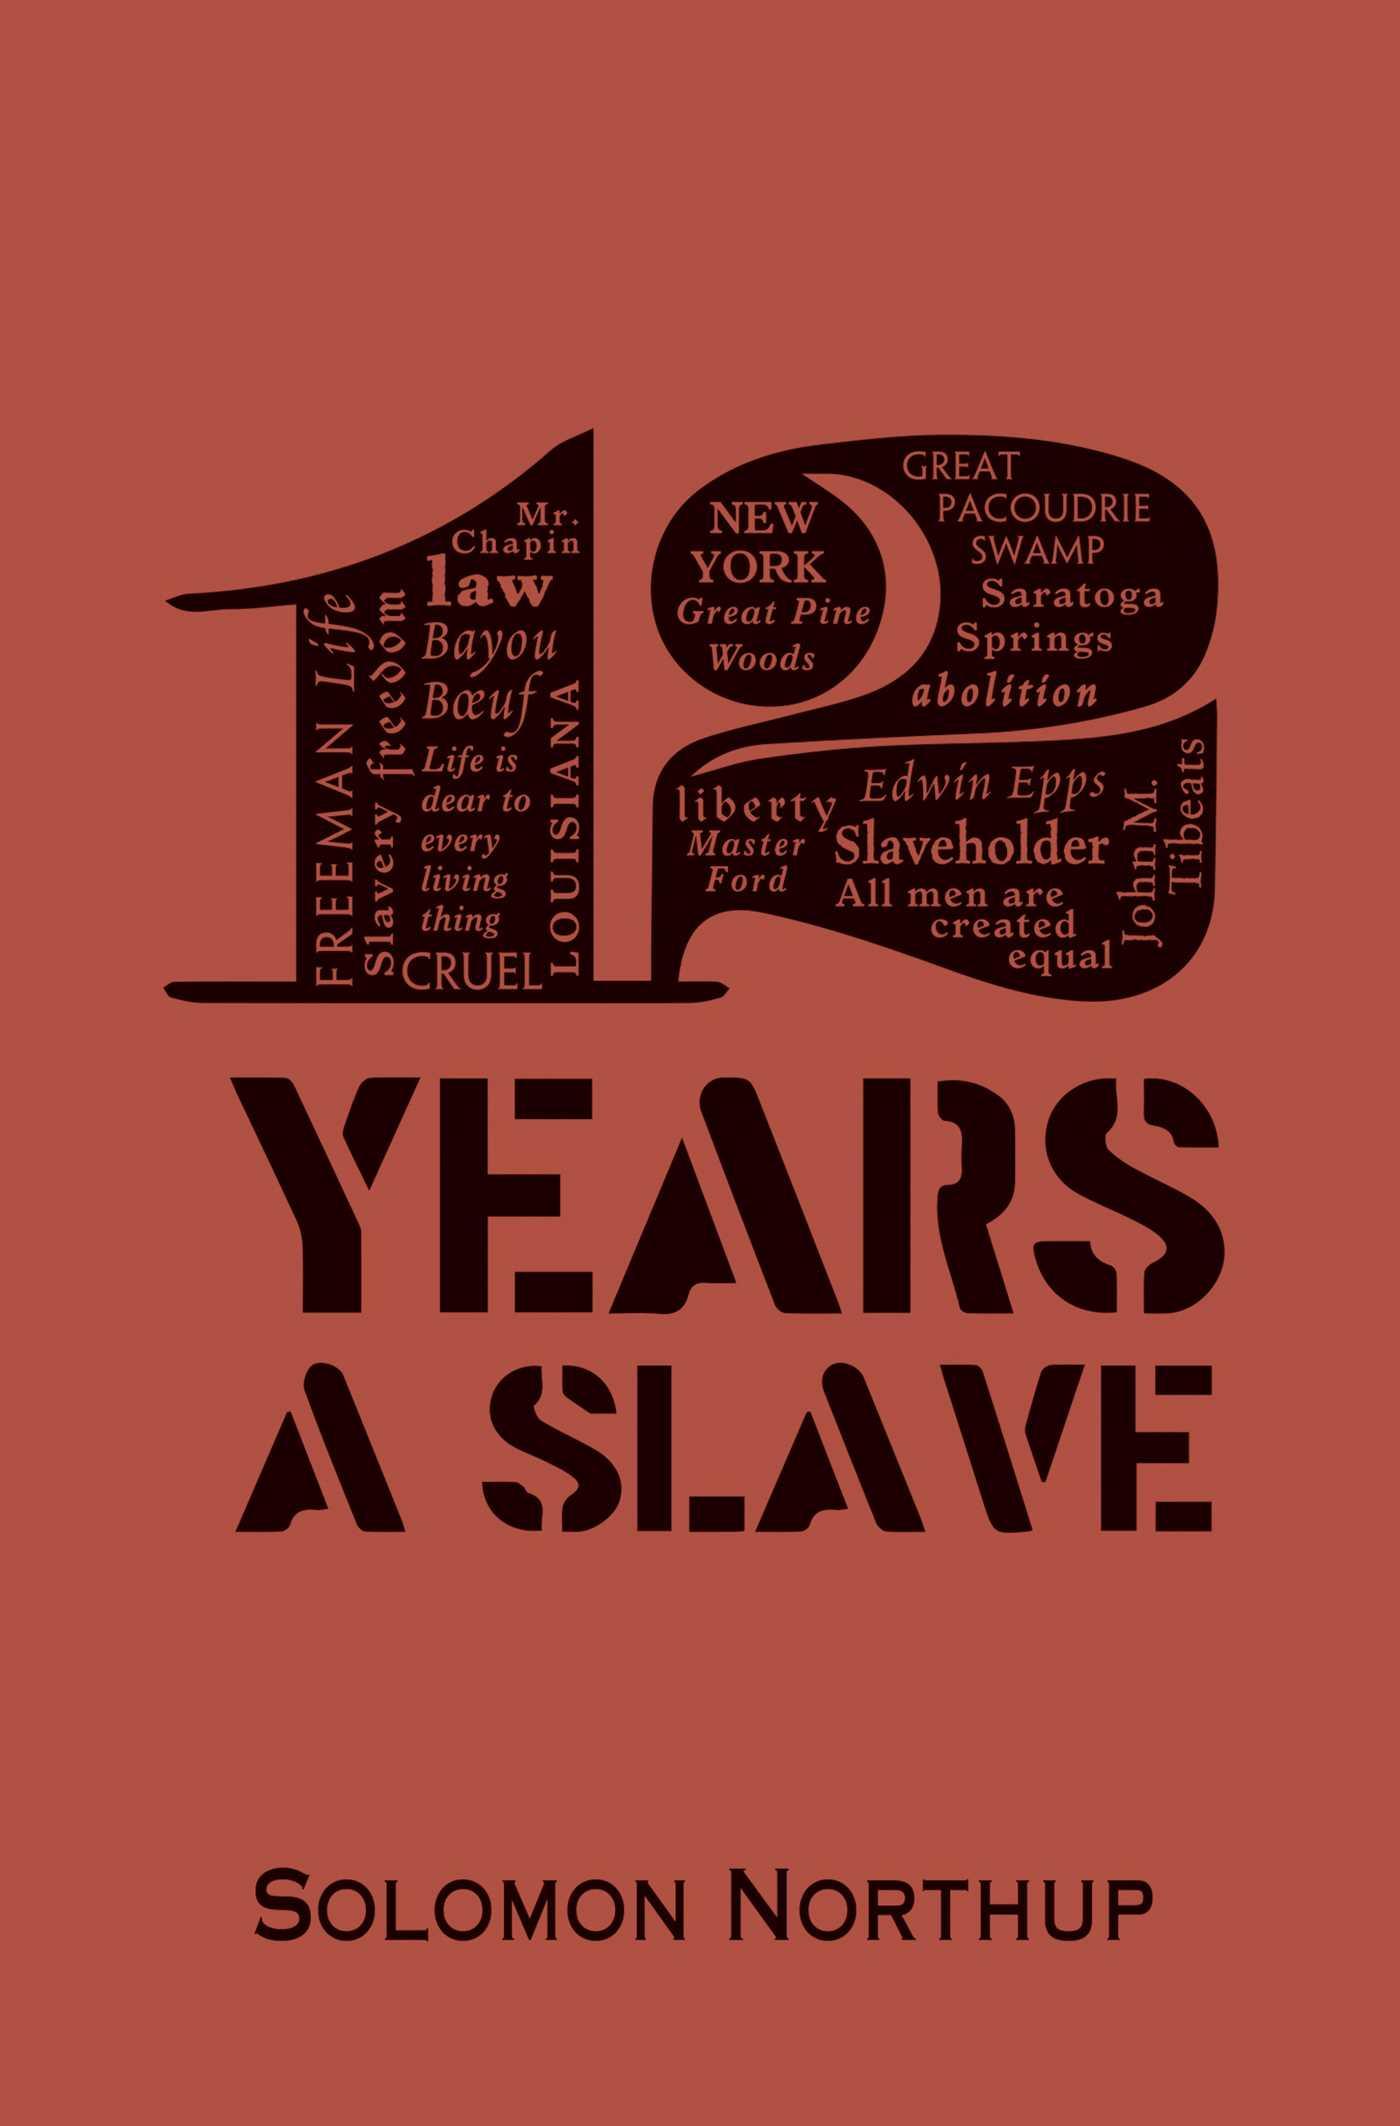 12 years a slave 9781626862364 hr